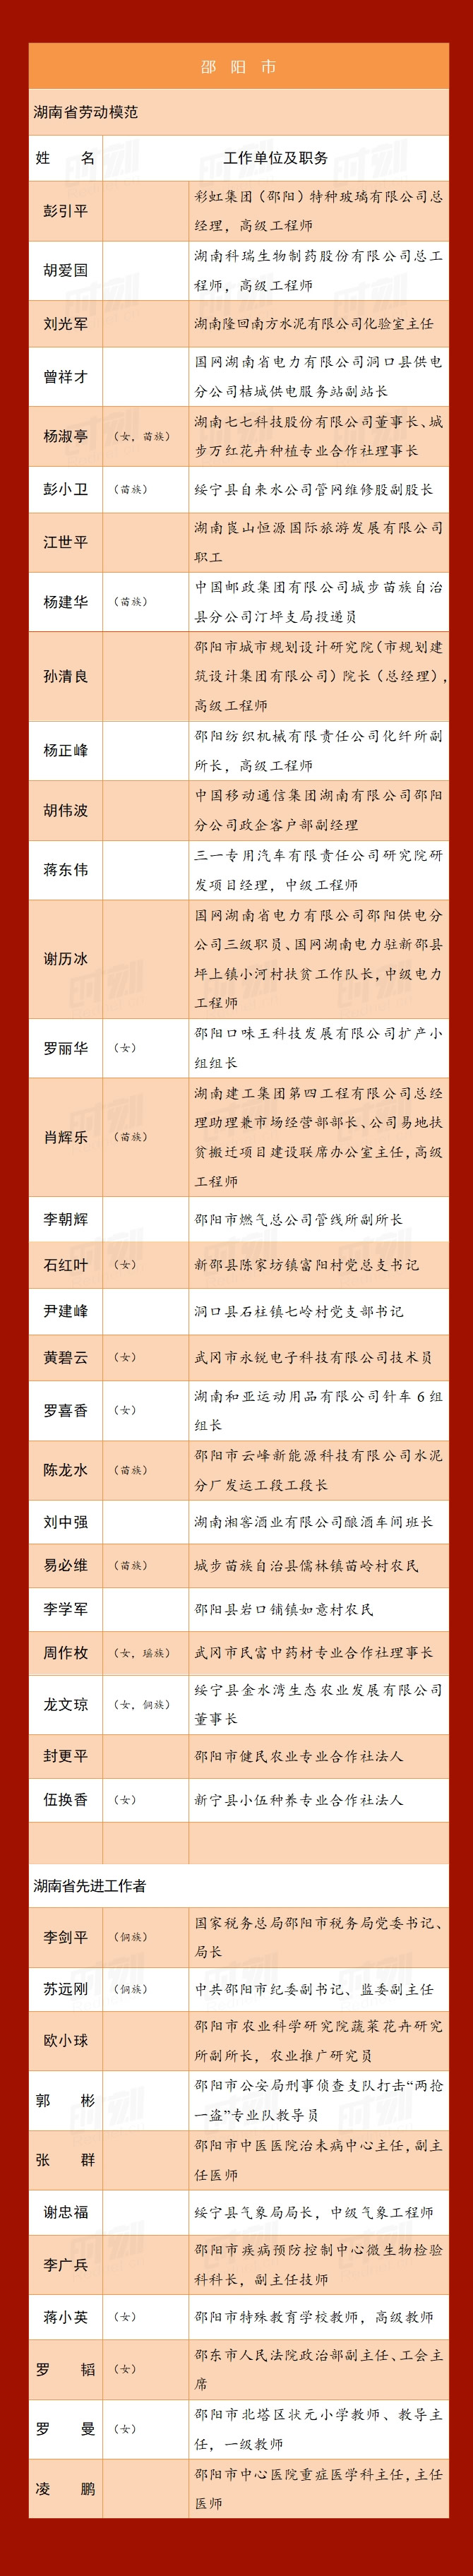 a5邵阳_r1_c1.jpg